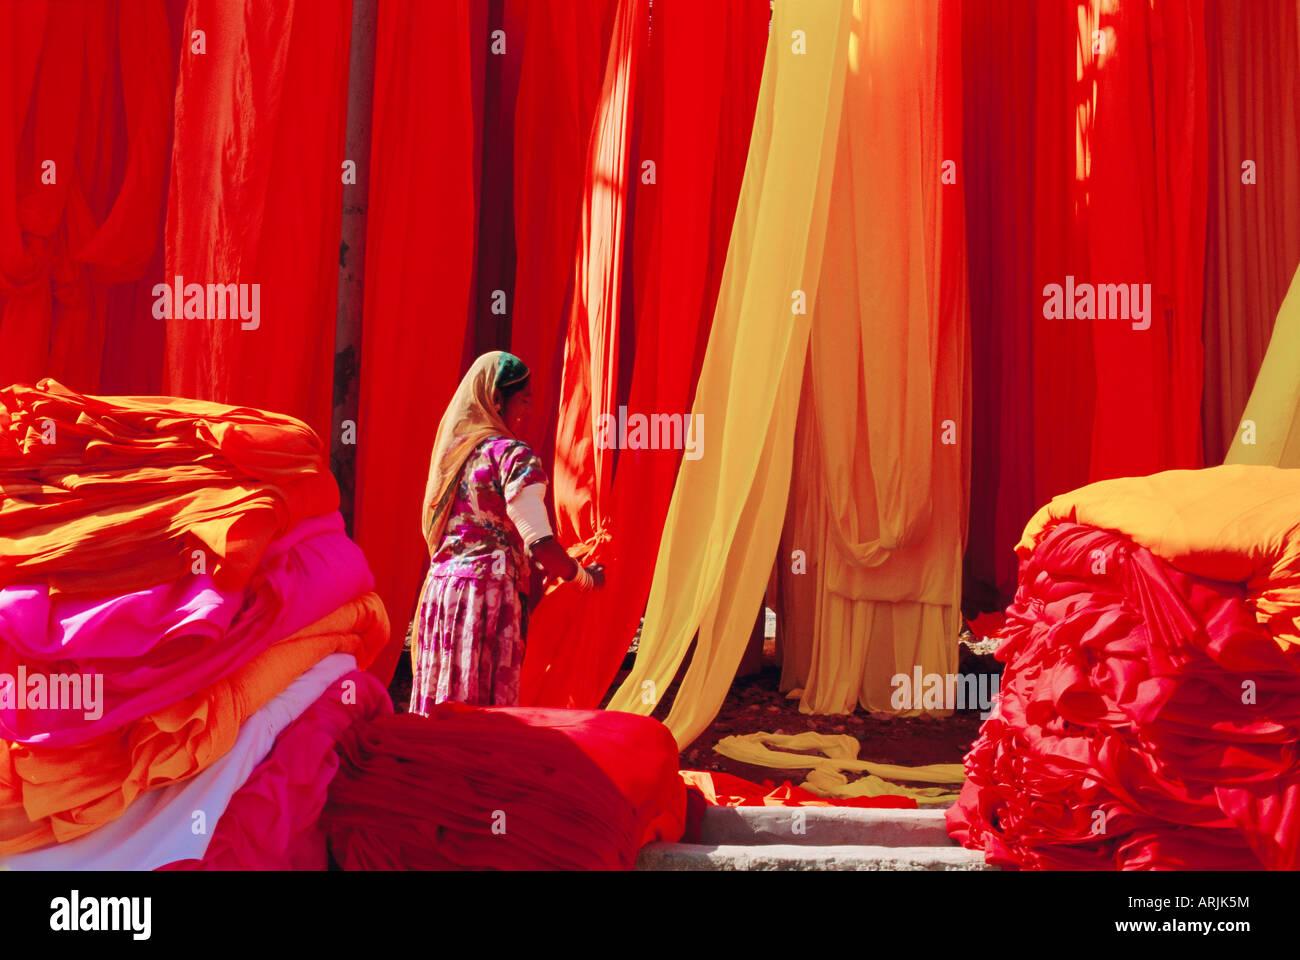 Sari fabbrica di indumento, Rajasthan, India Immagini Stock